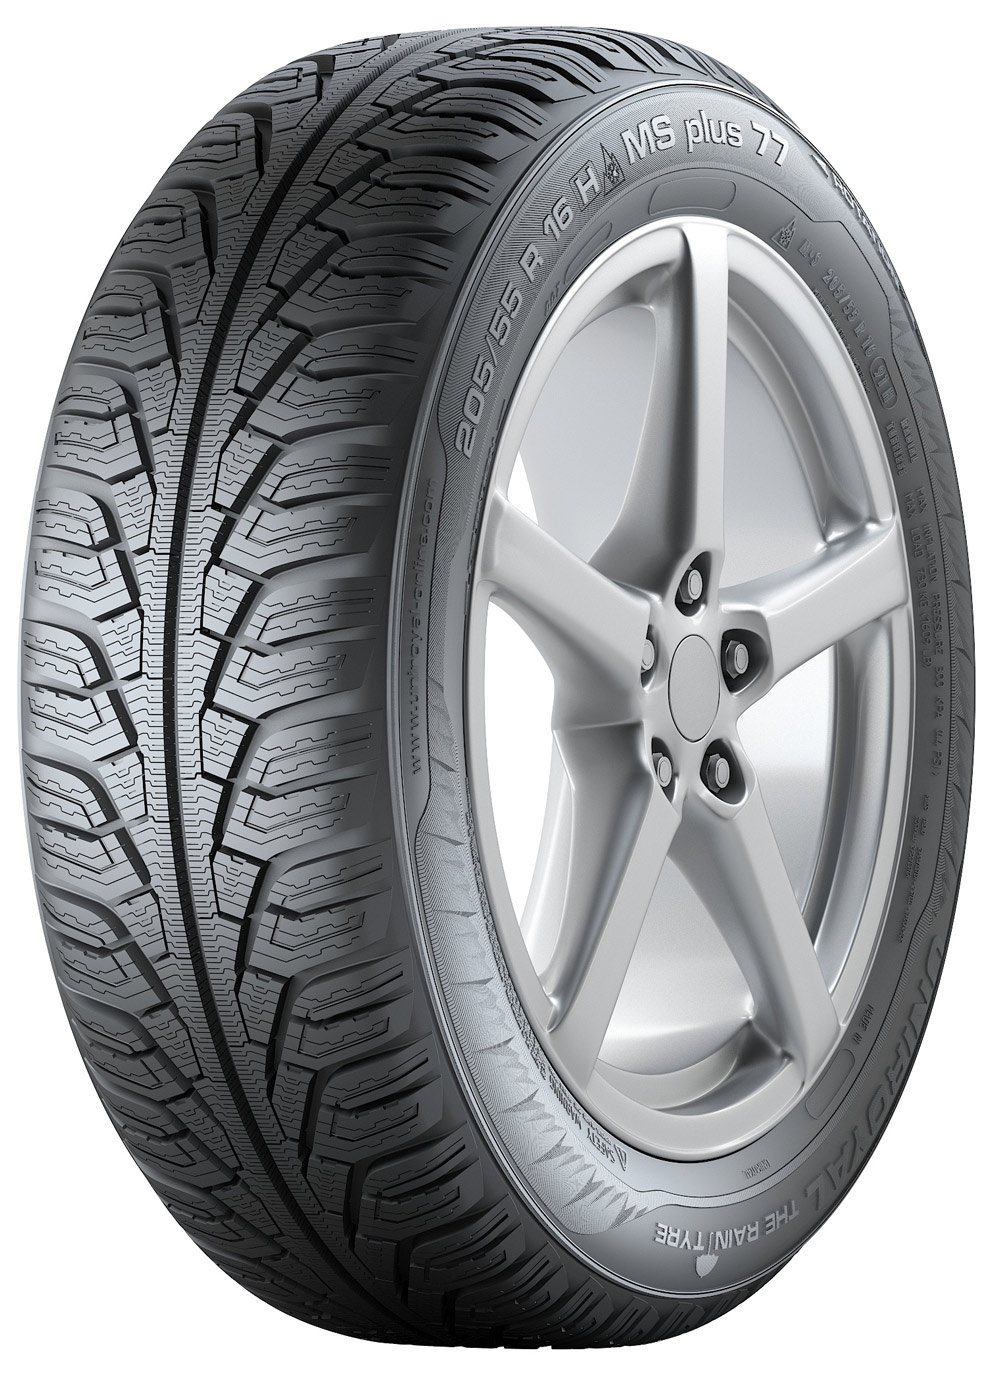 Neumático UNIROYAL MS plus 77 175/65R13 80 T